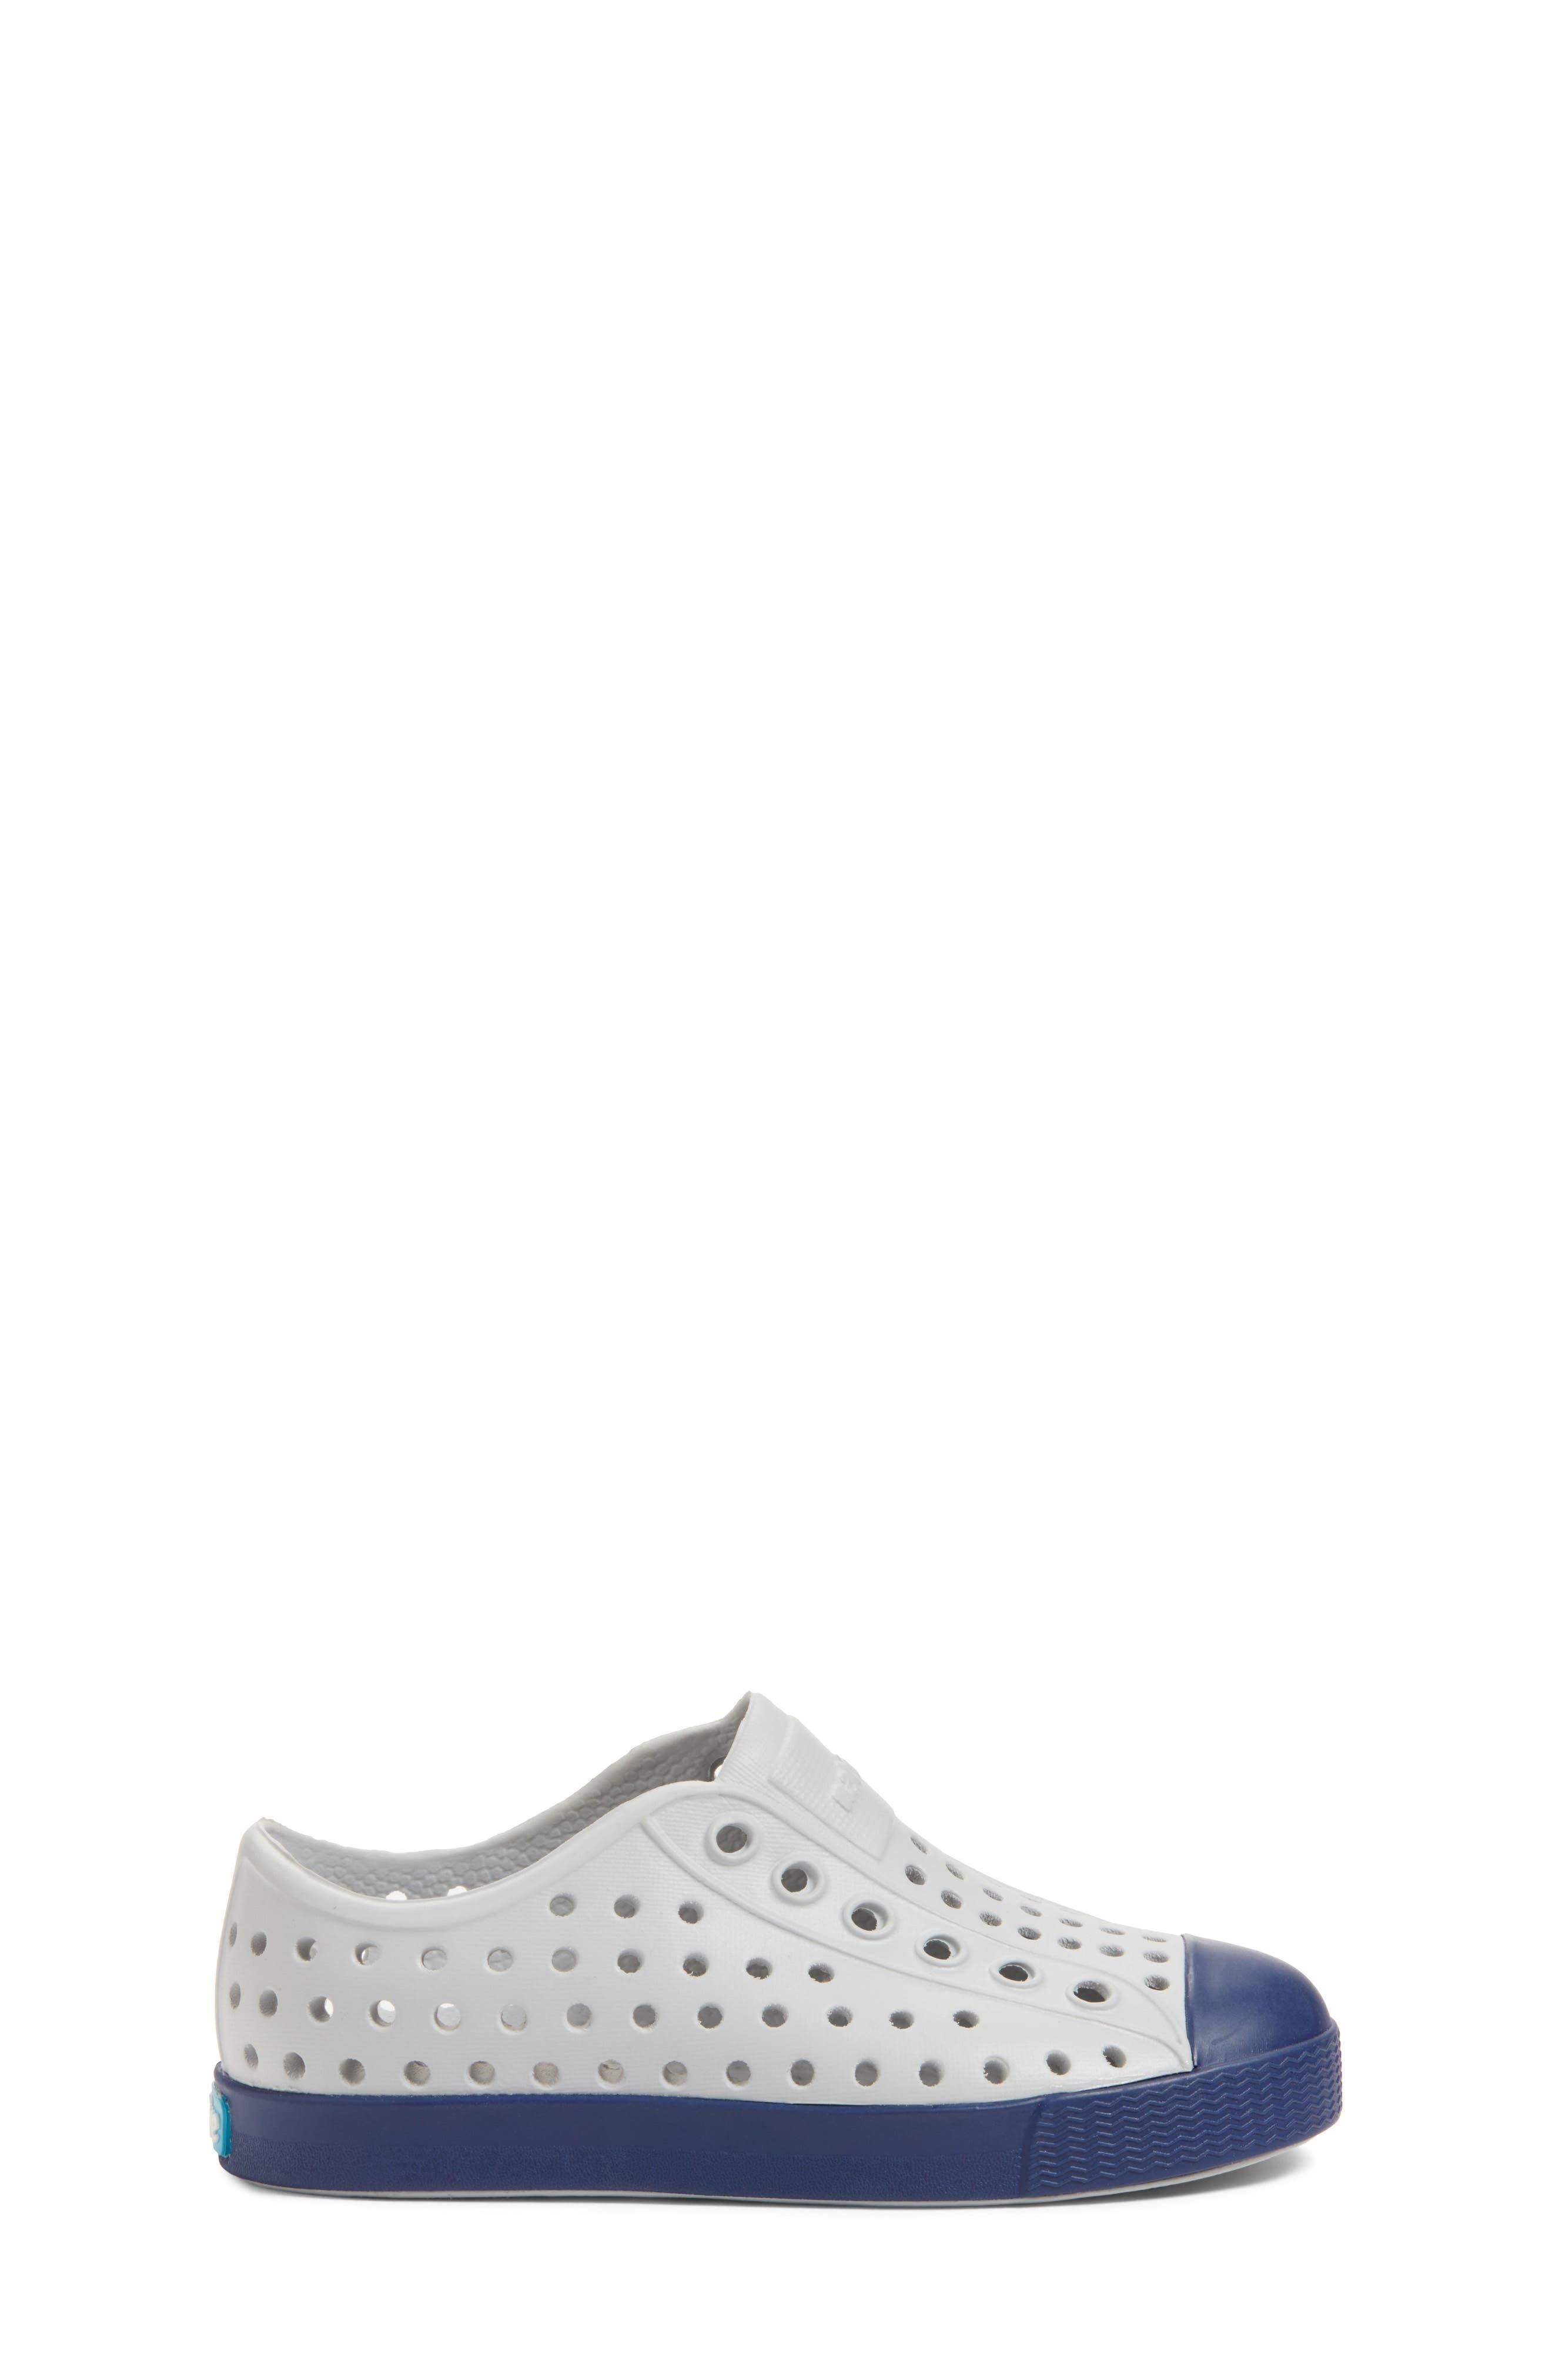 'Jefferson' Water Friendly Slip-On Sneaker,                             Alternate thumbnail 124, color,